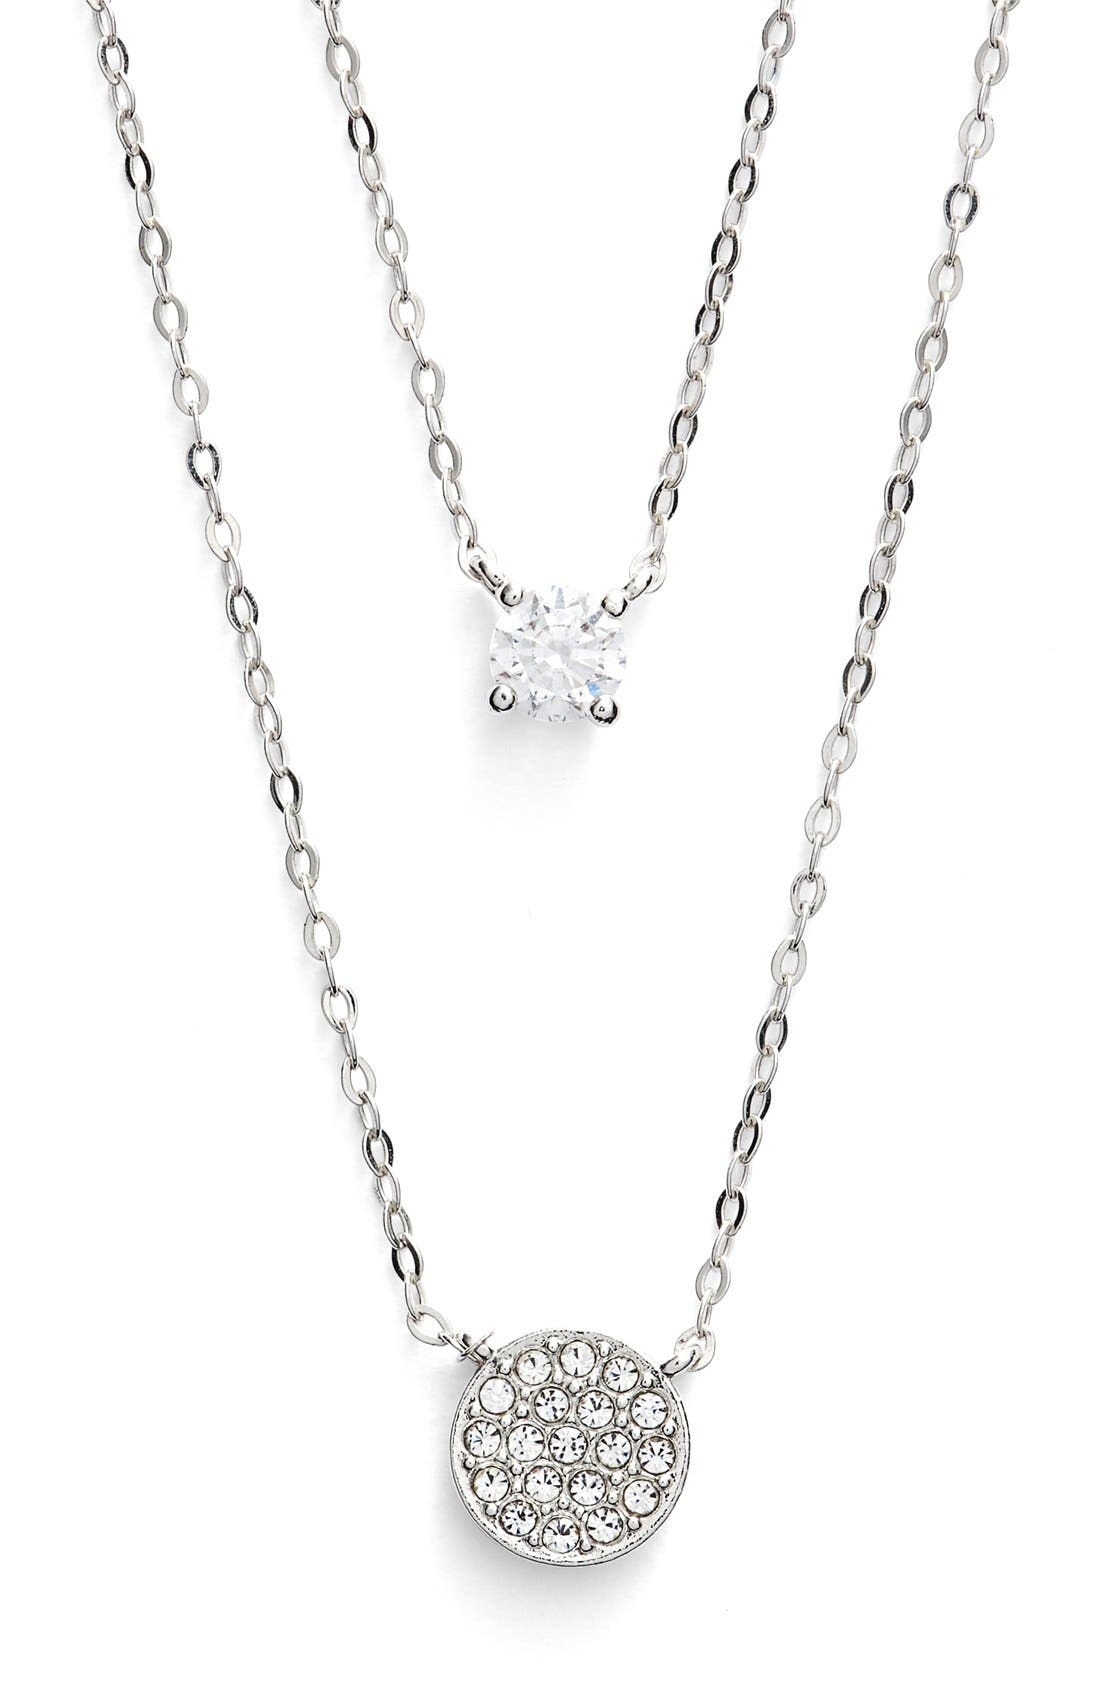 Double Pendant Necklace,                         Main,                         color, Silver/ Clear